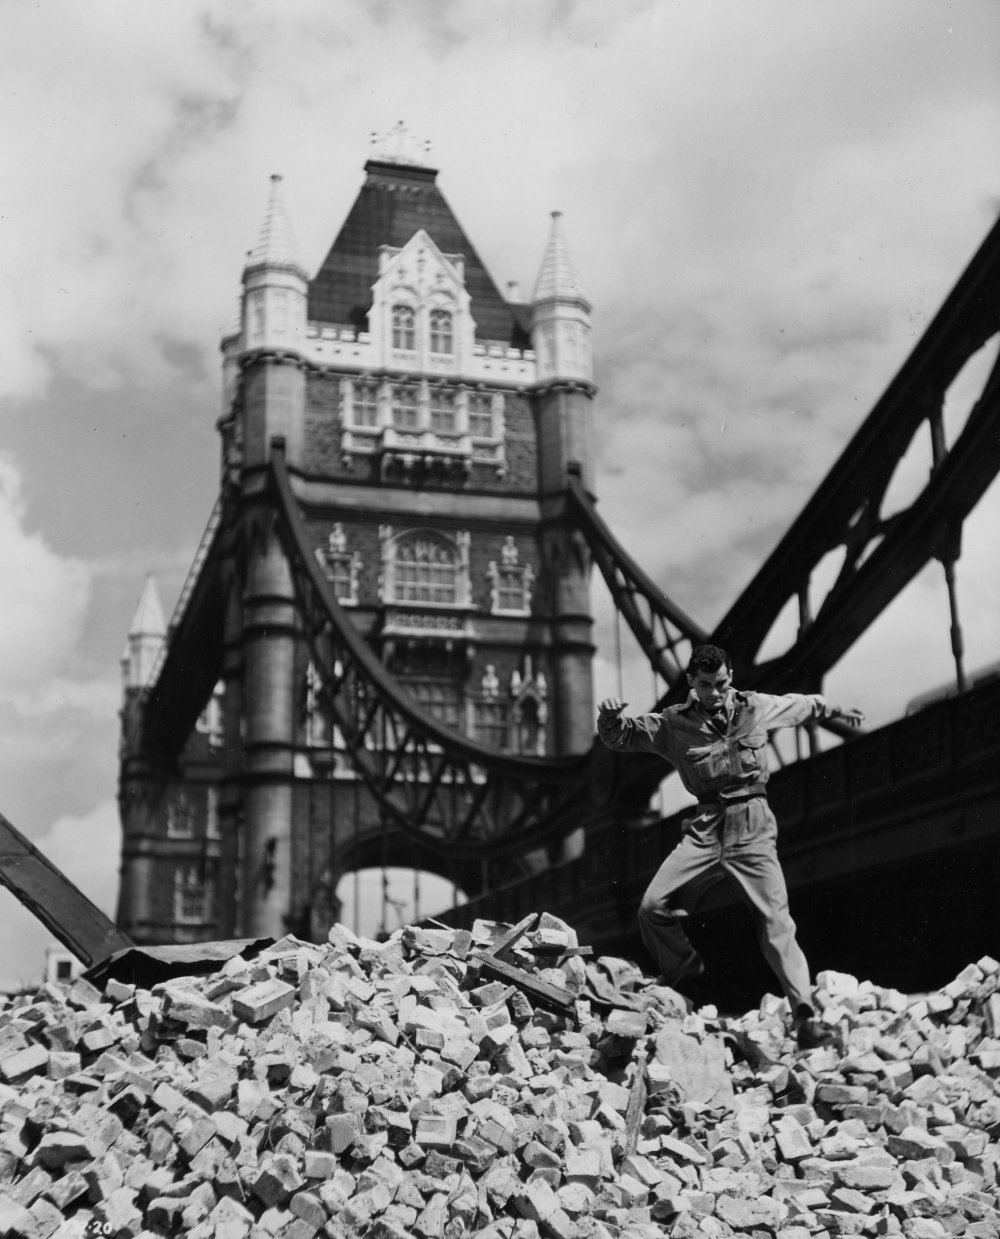 Pool of London (1950)